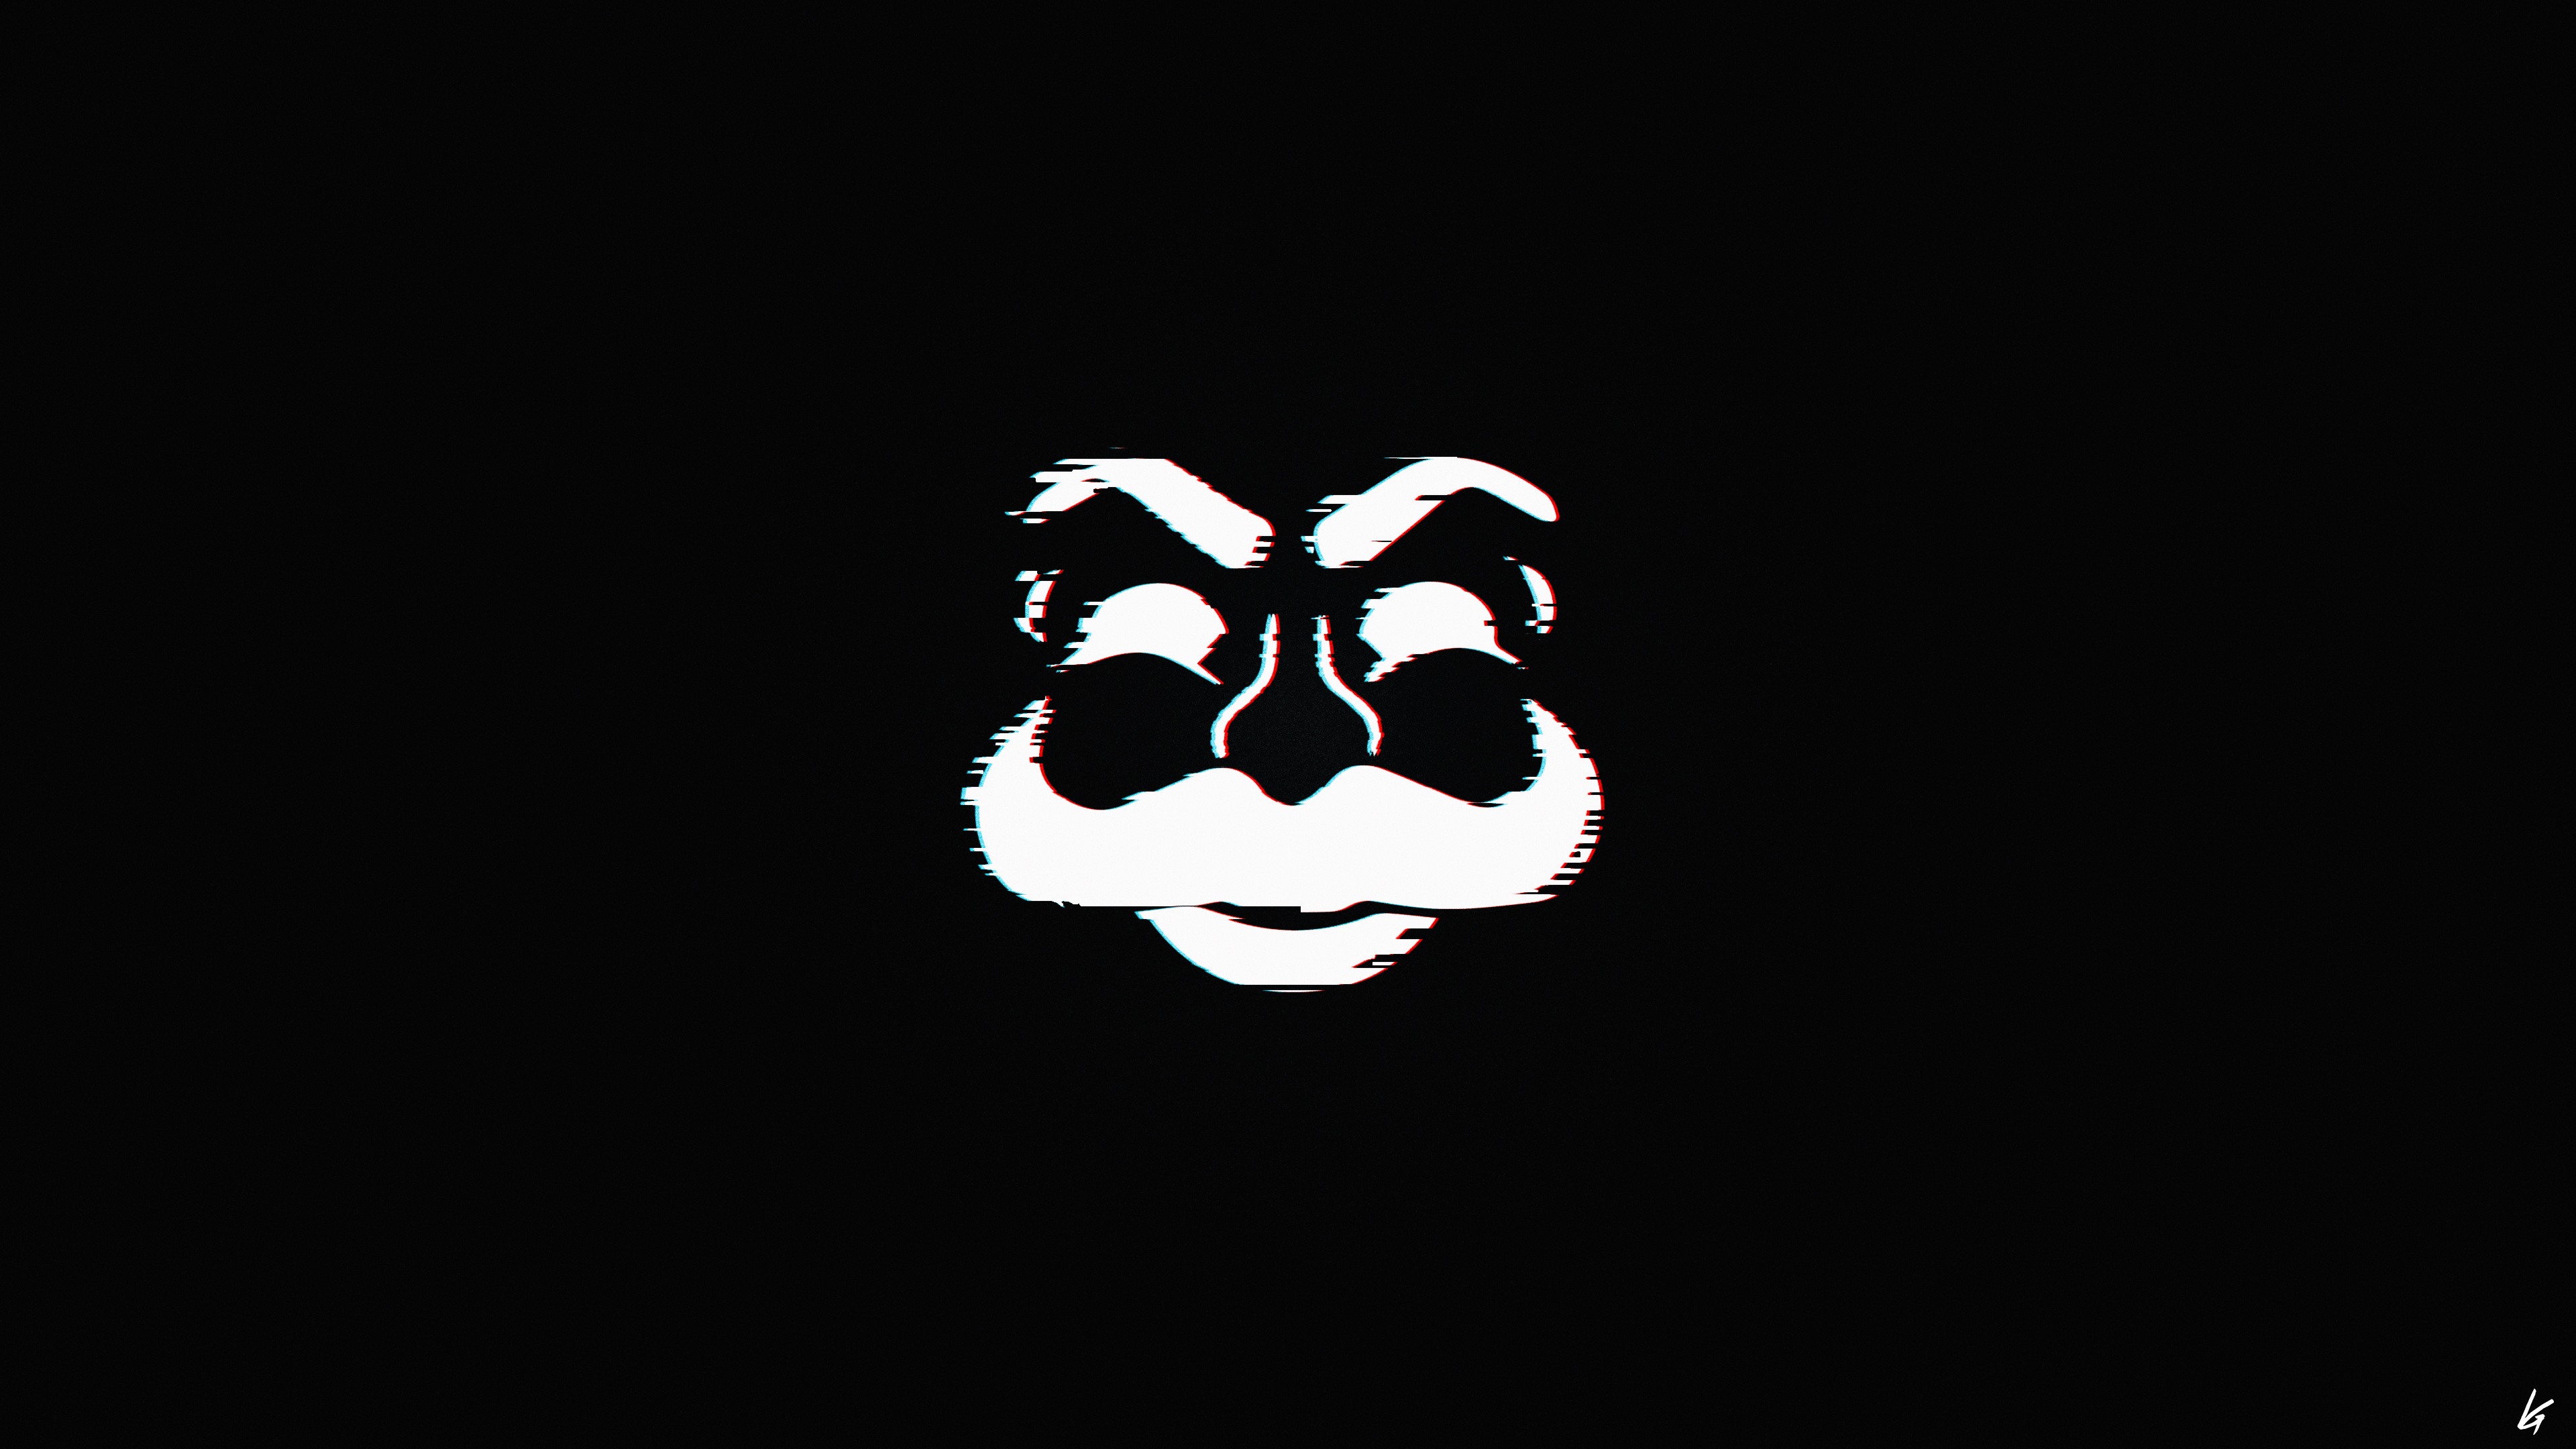 Download 3840x2400 Wallpaper Fsociety Logo Tv Show Minimal Mr Robot 4k Ultra Hd 16 10 Widescreen 3840x2400 Hd Image Background 7237